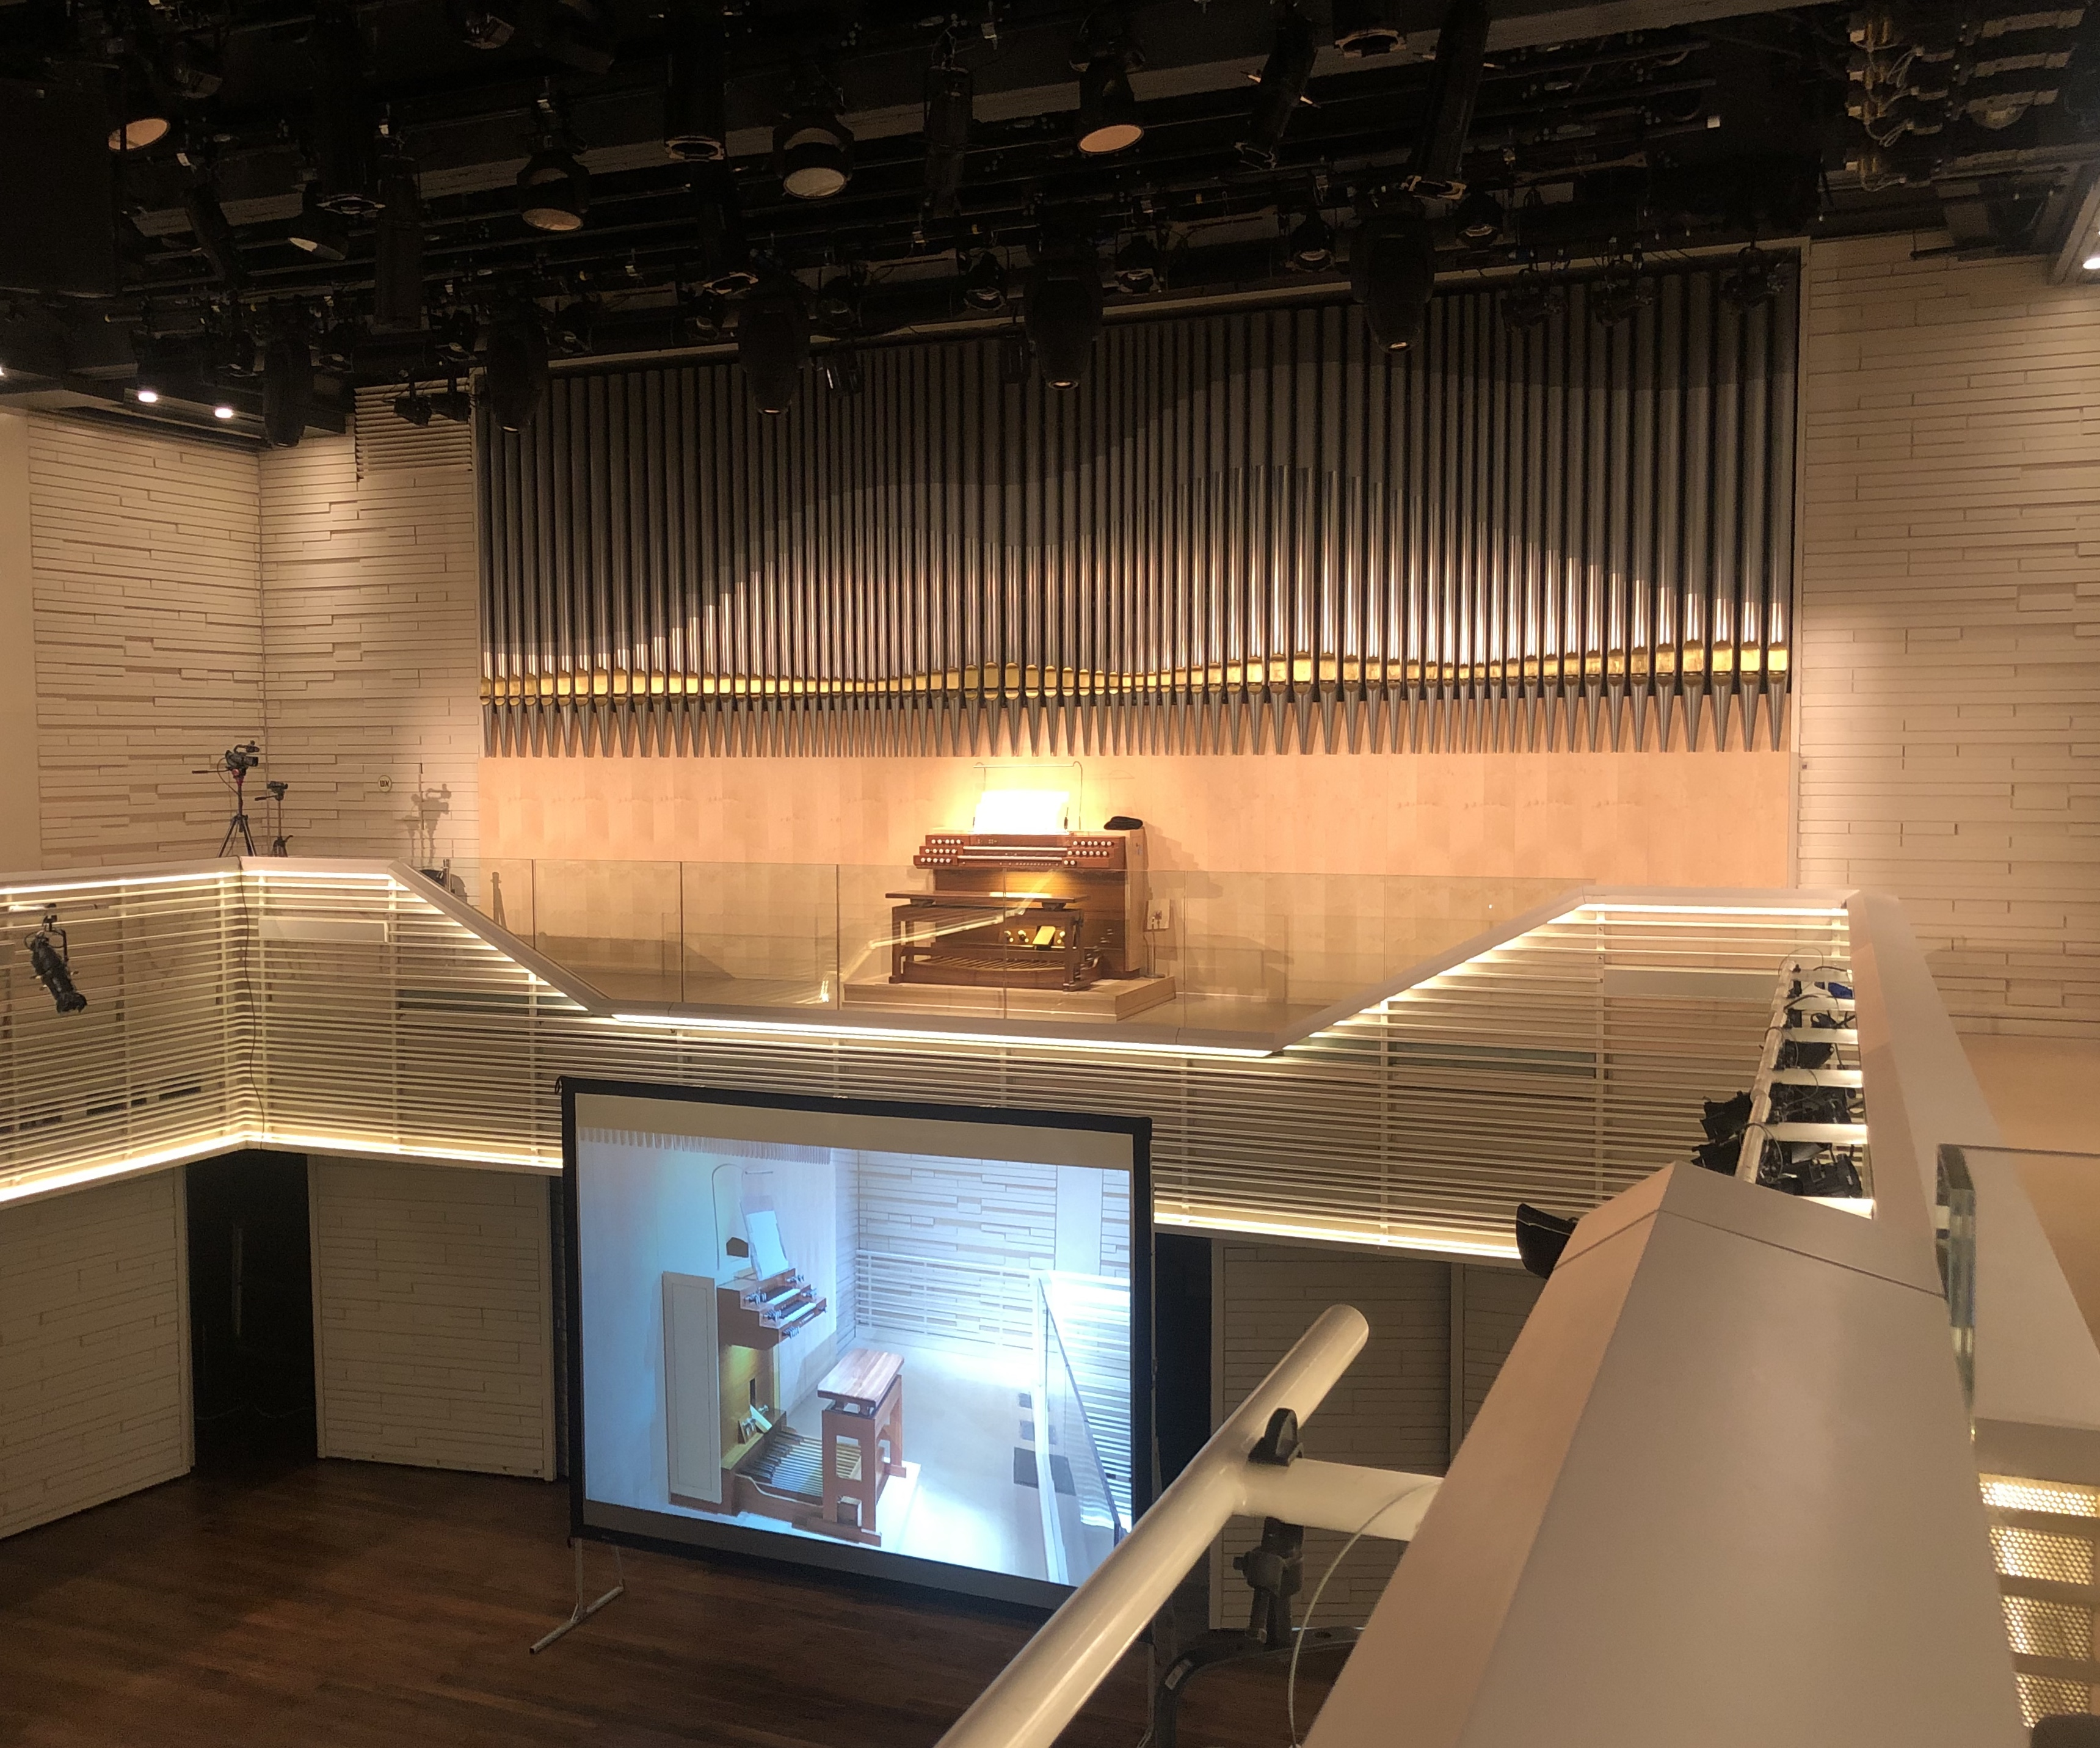 Elma: Орган в концертном зале. Фото: Елена Шафран